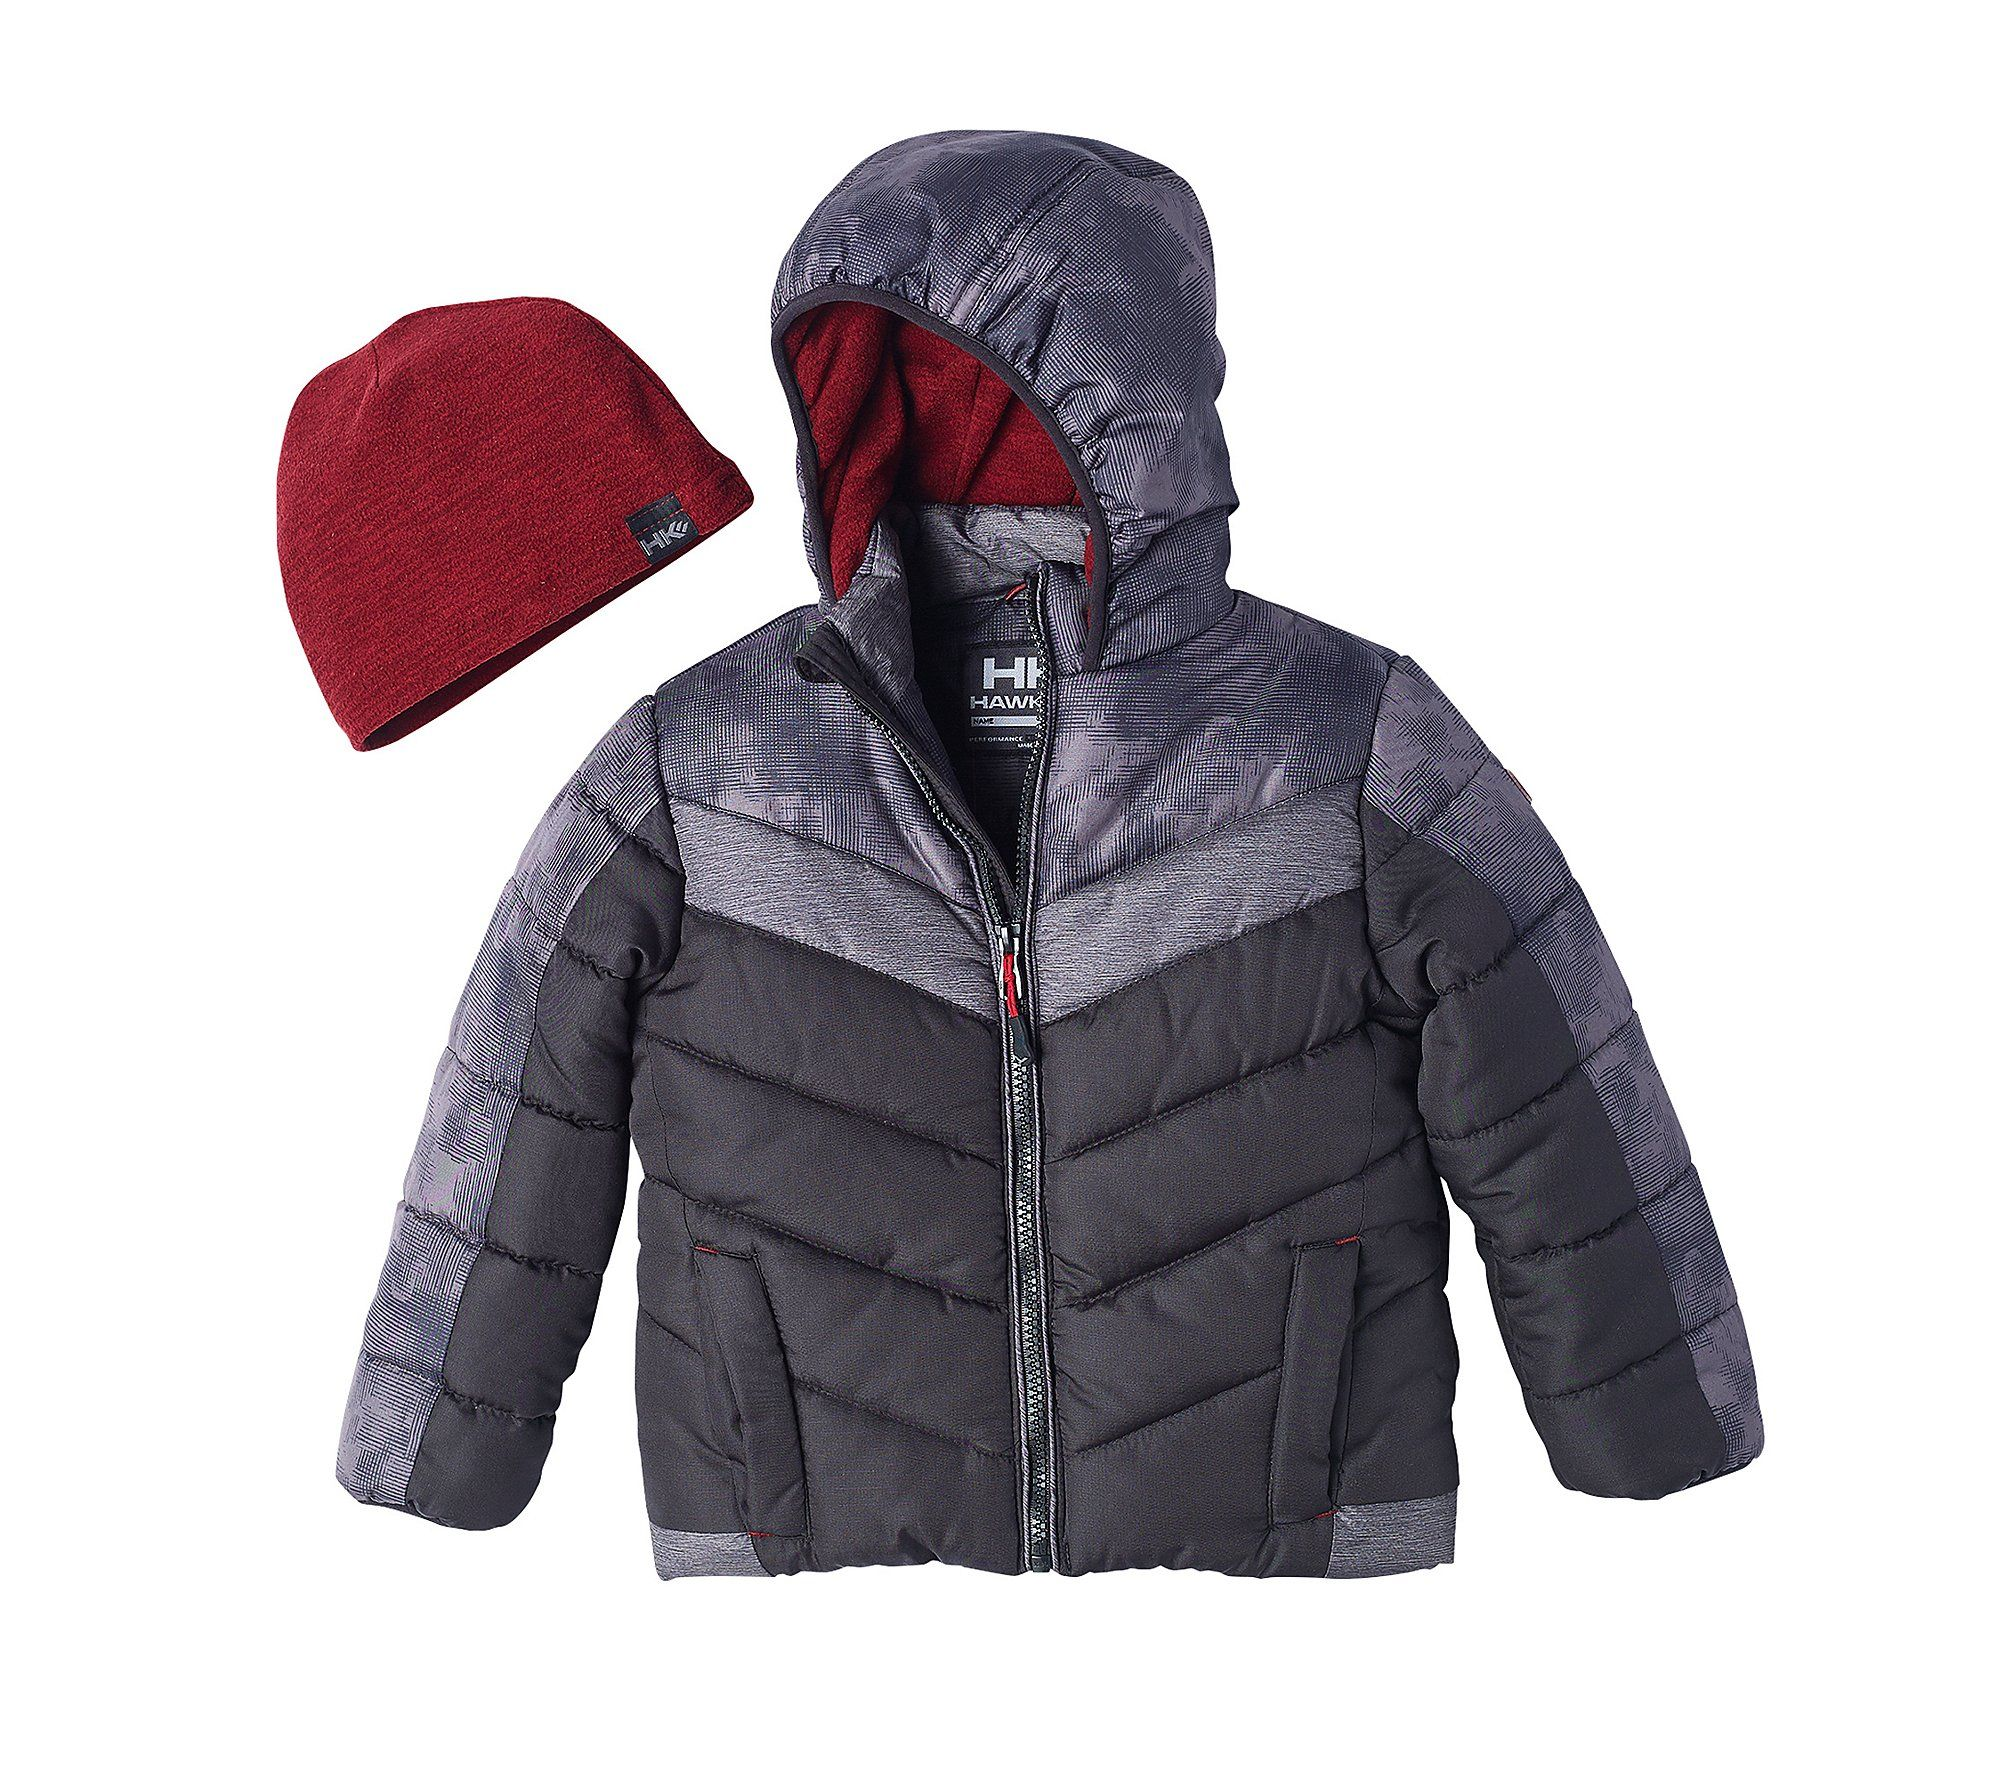 9096f3d74 Hawke & Co. Boys 2t-4t Bubble Jacket Black 2T. Polyester / Cotton ...